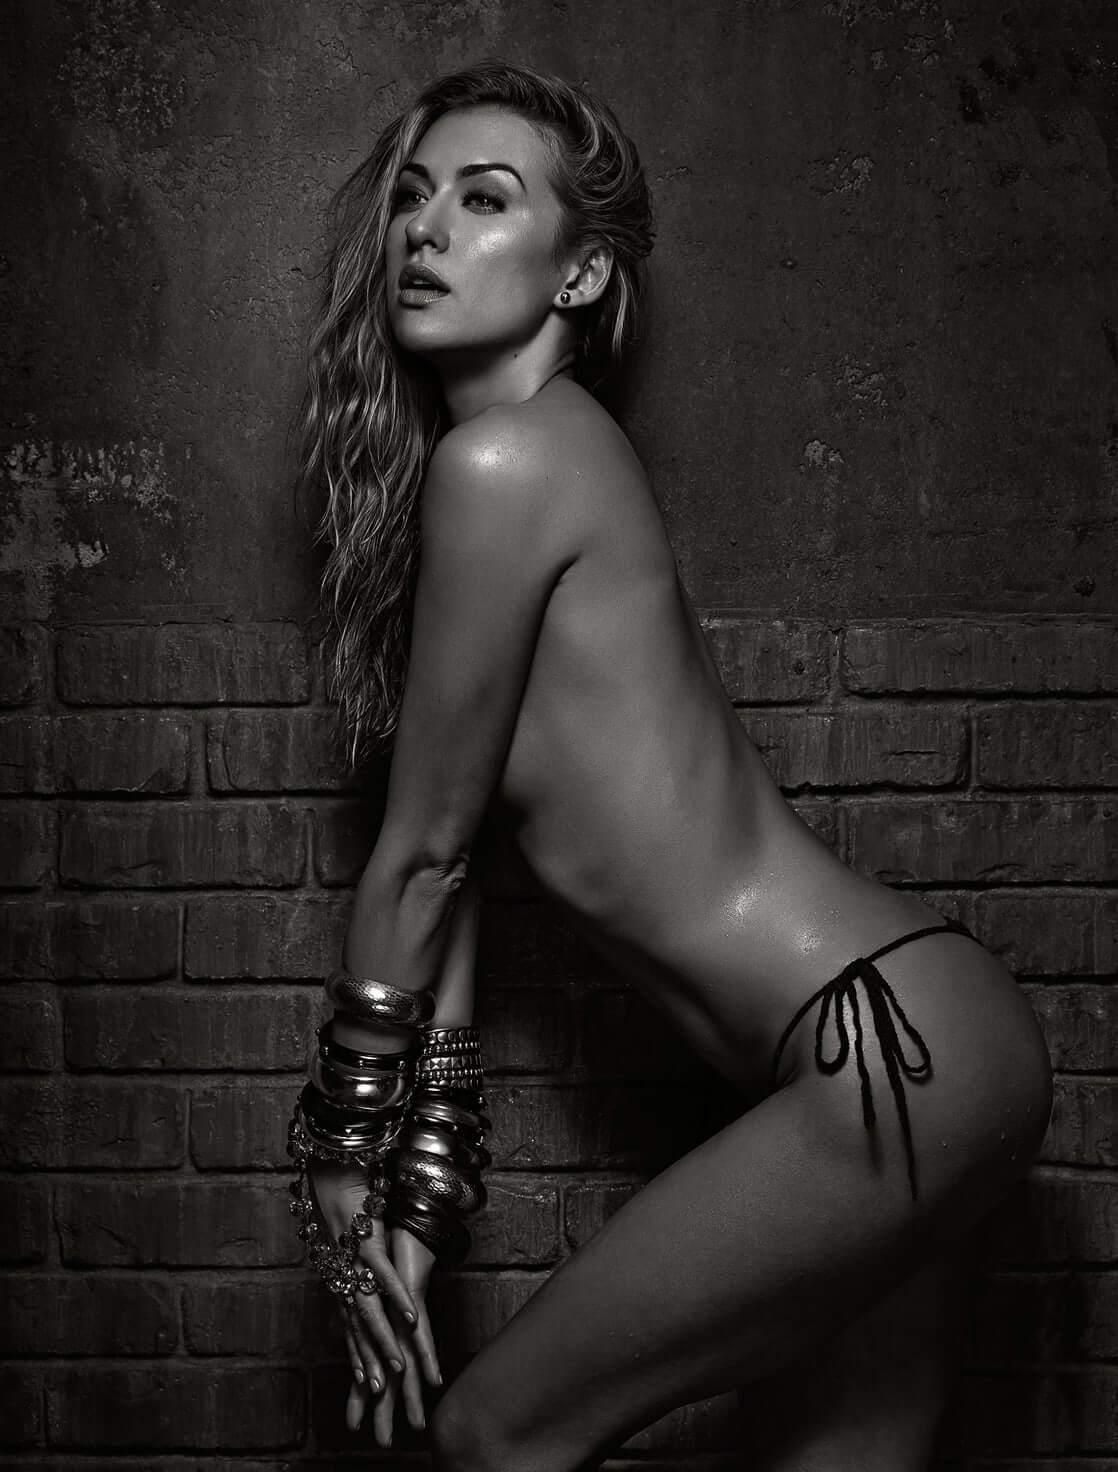 Tasya Teles naked pics